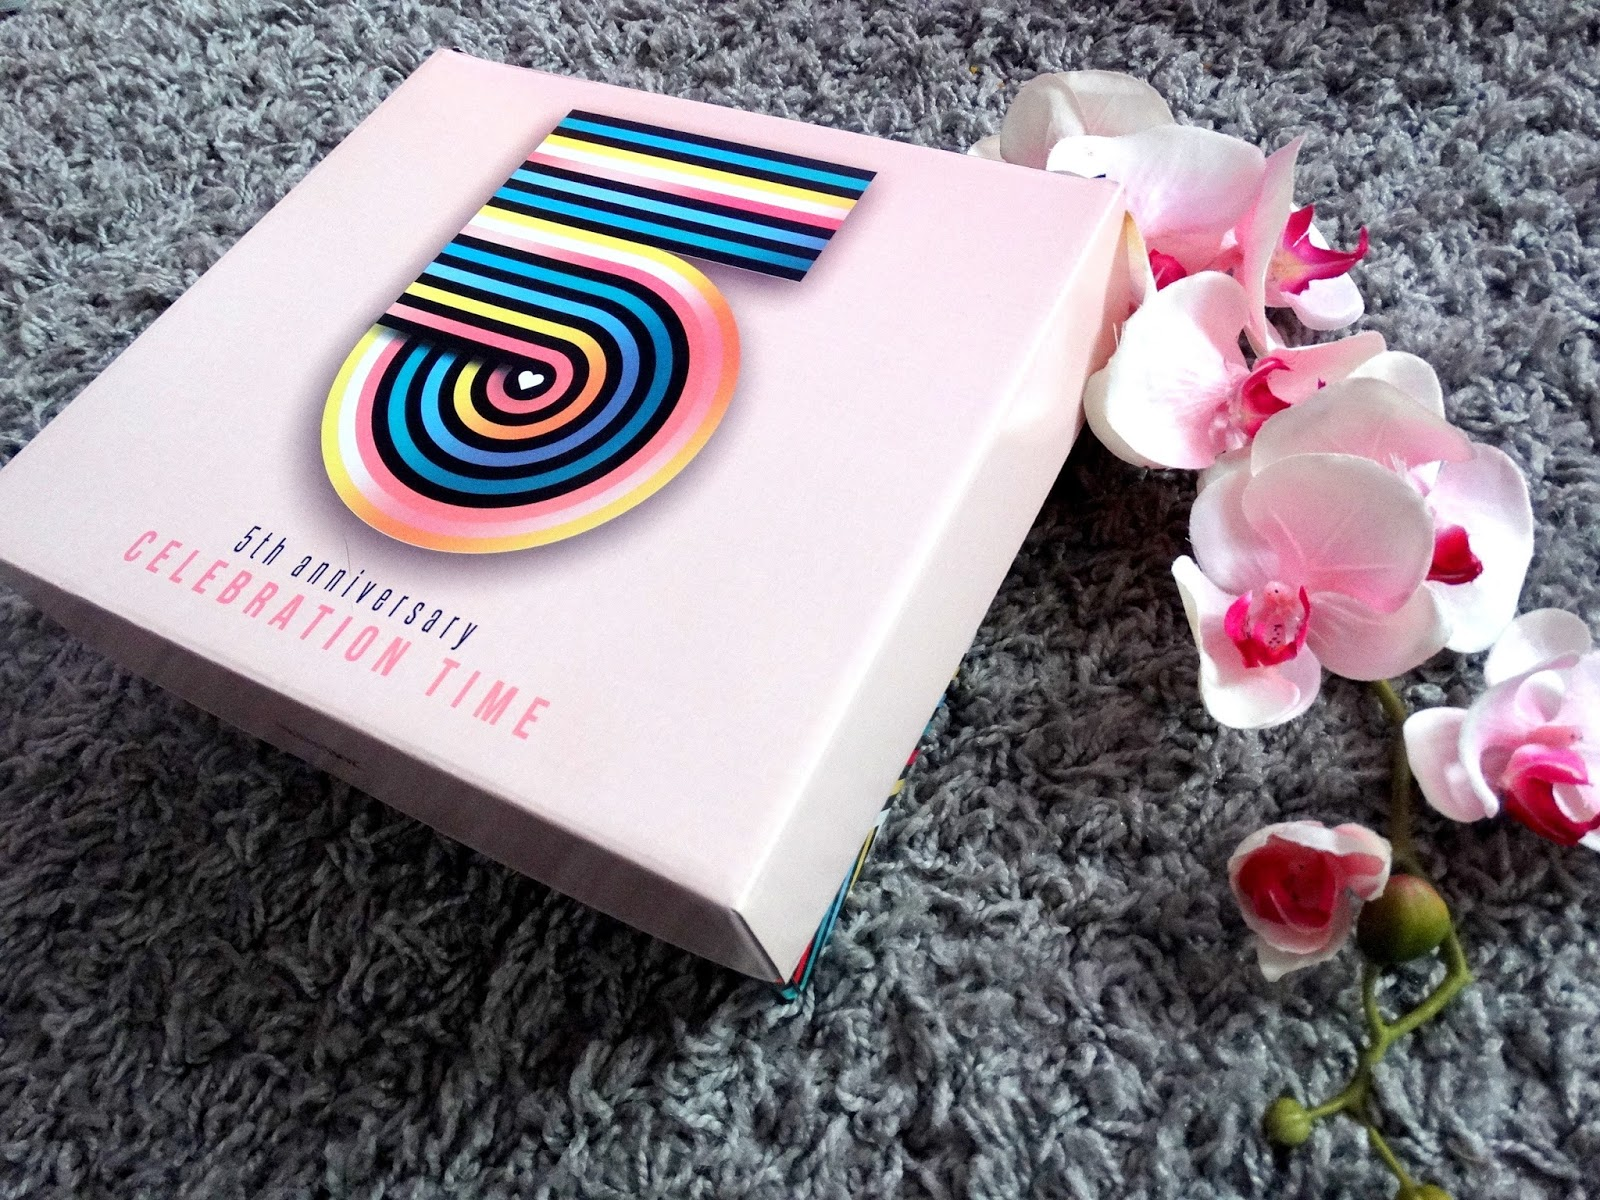 5TH ANNIVERSARY SHINY BOX 'Celebration Time'